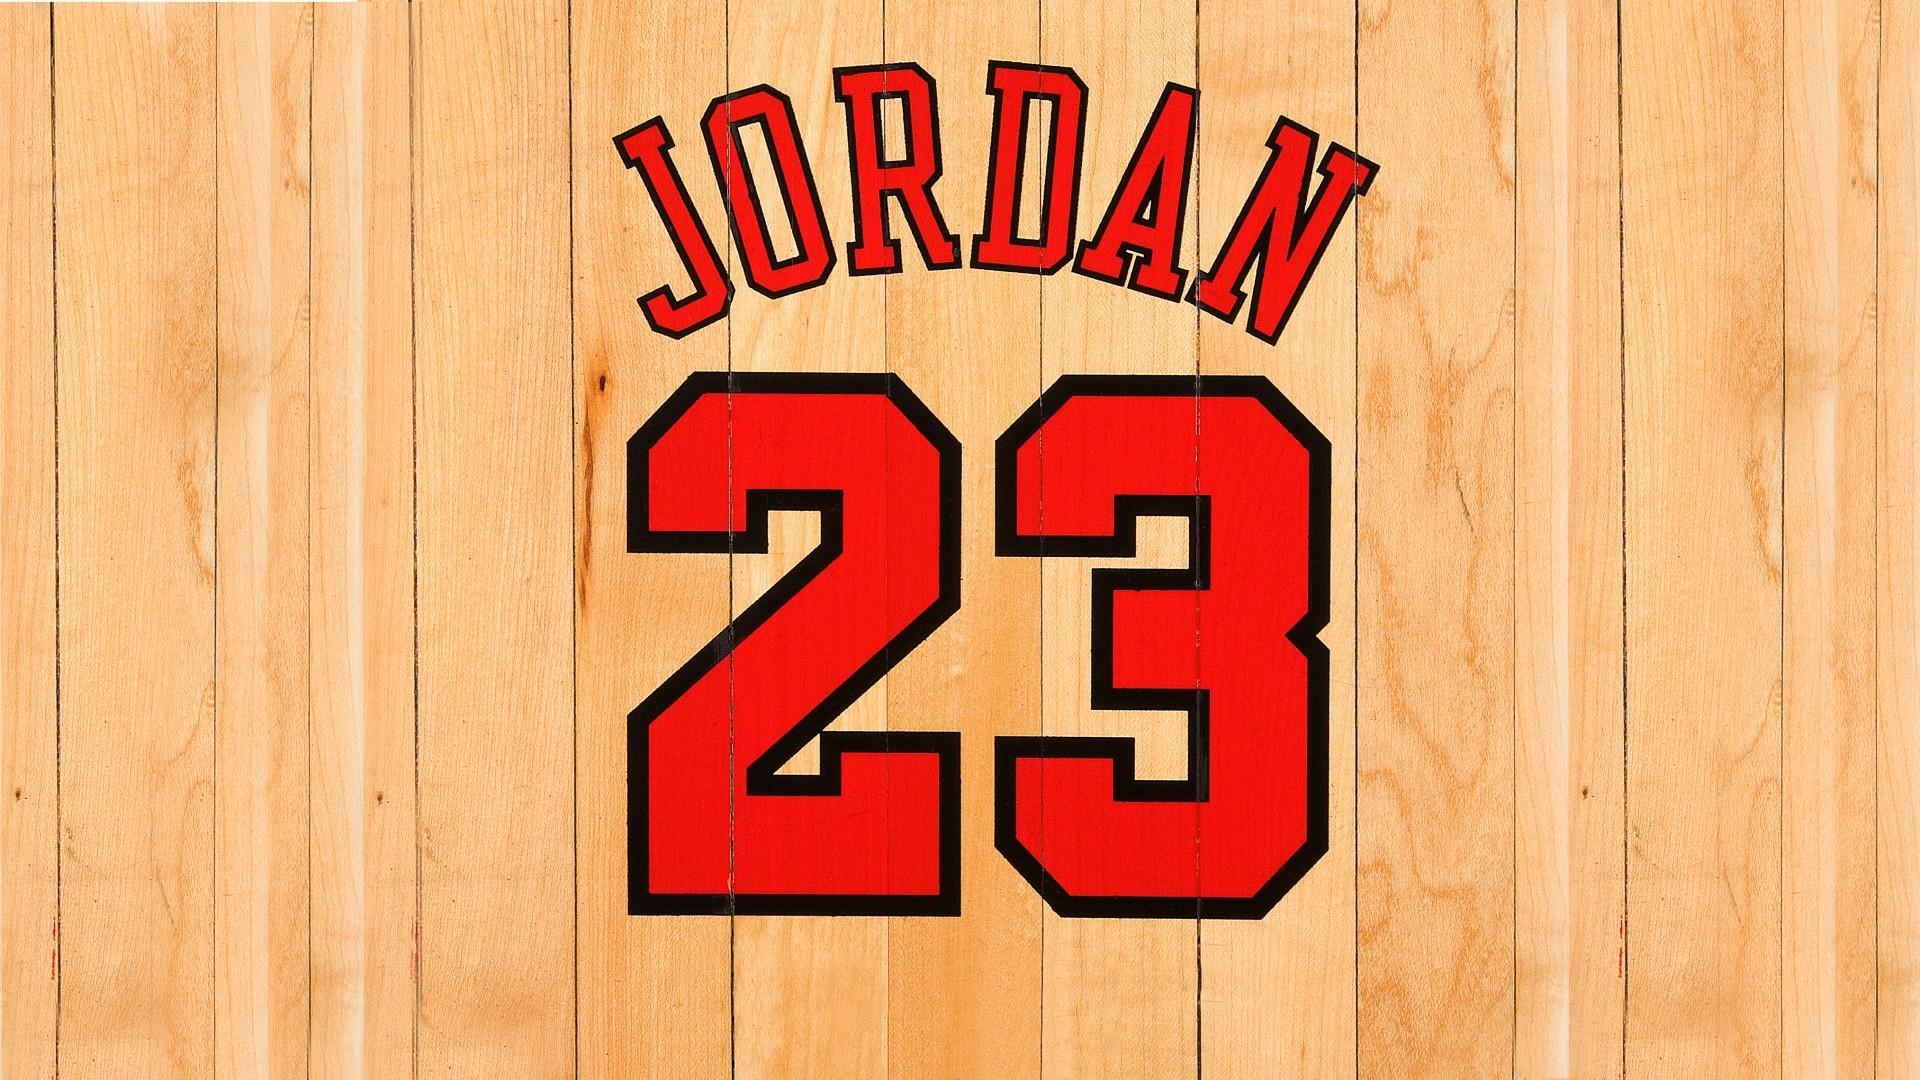 Michael Jordan HD Wallpapers Wallpaper   HD Wallpapers   Pinterest    Michael jordan, Hd wallpaper and Wallpaper